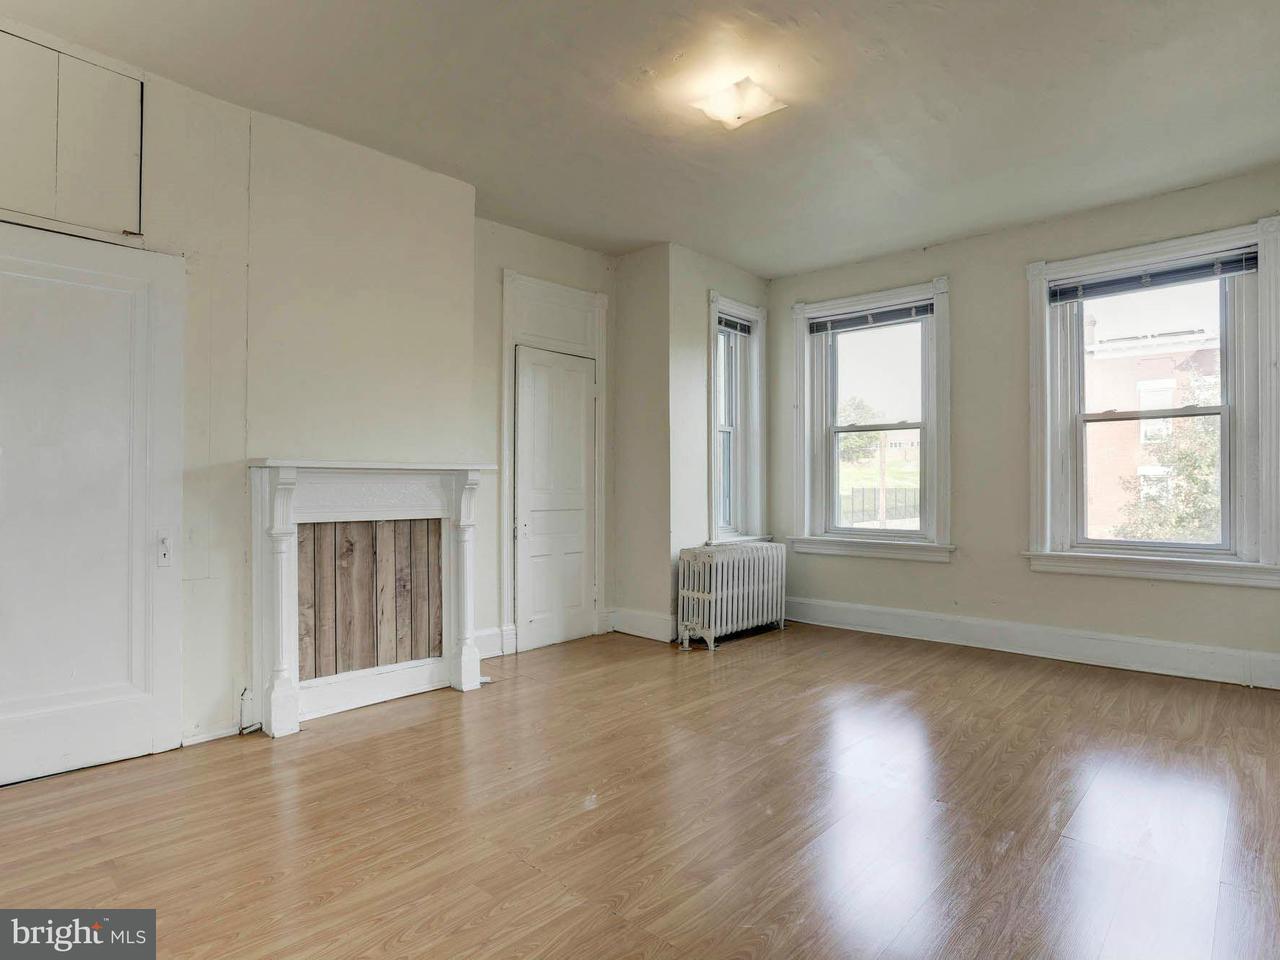 Additional photo for property listing at 1700 1st St Ne 1700 1st St Ne Washington, Distrito De Columbia 20002 Estados Unidos